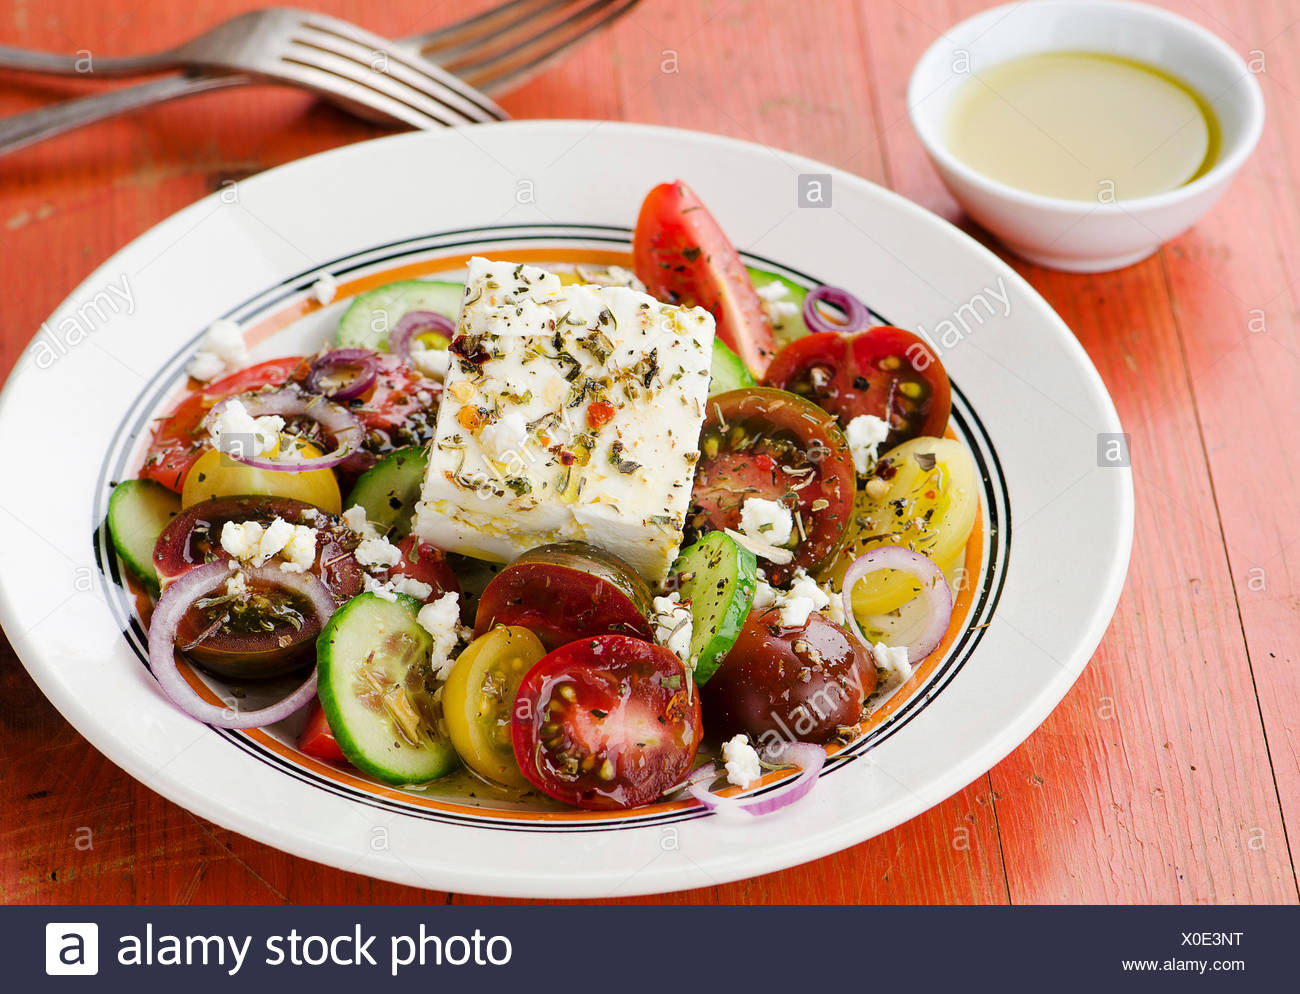 Salade grecque à la feta Photo Stock